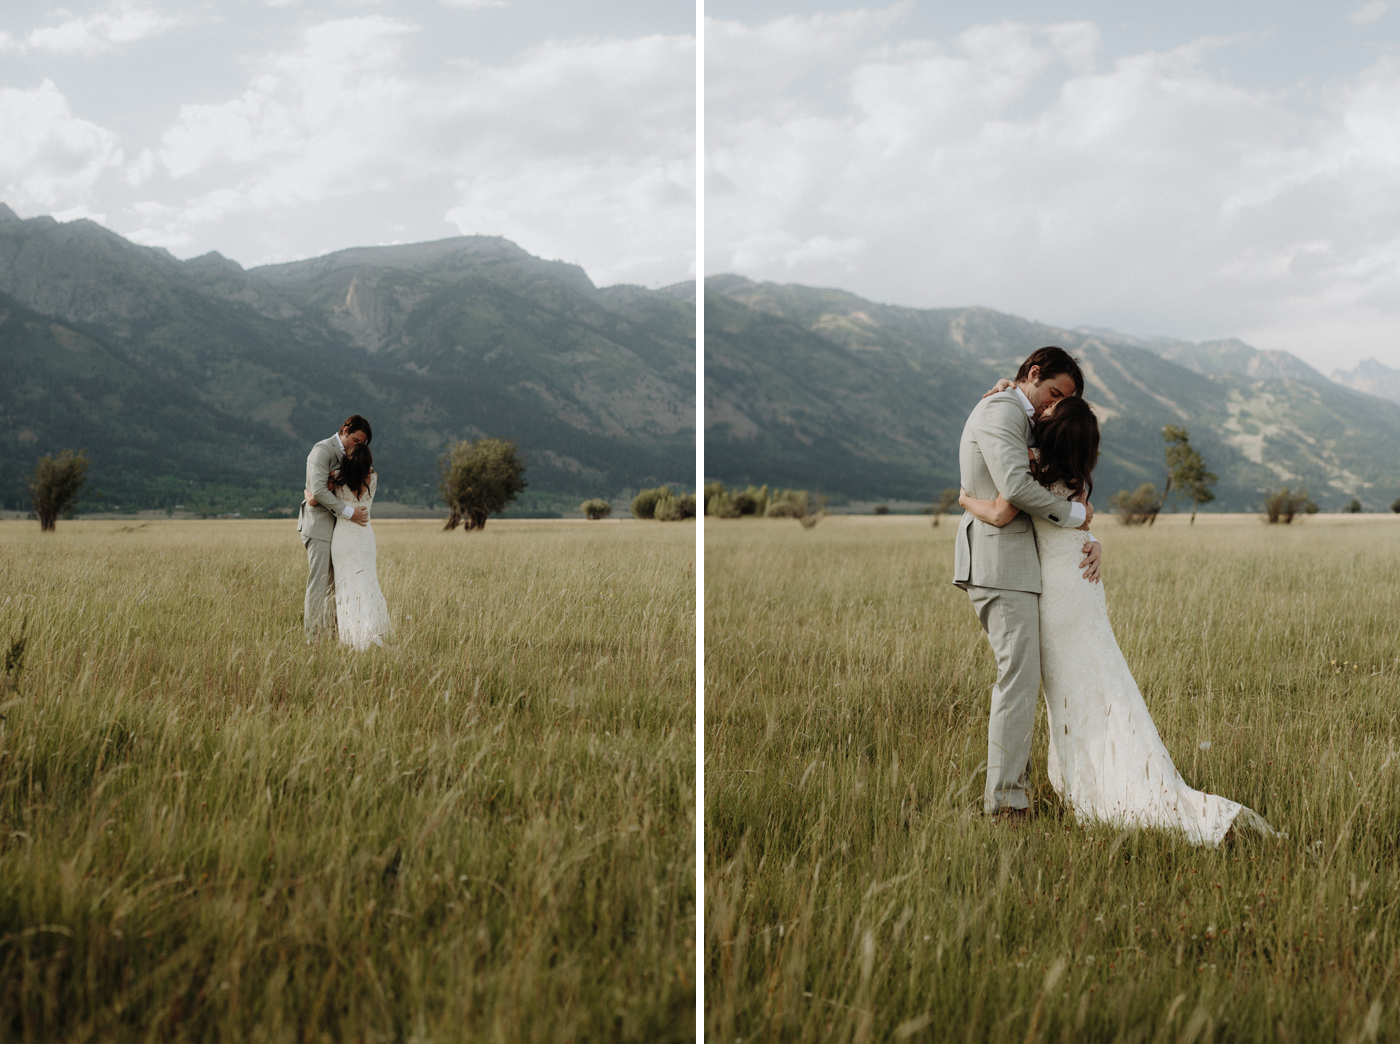 051-grand-teton-jackson-hole-wyoming-wedding.jpg